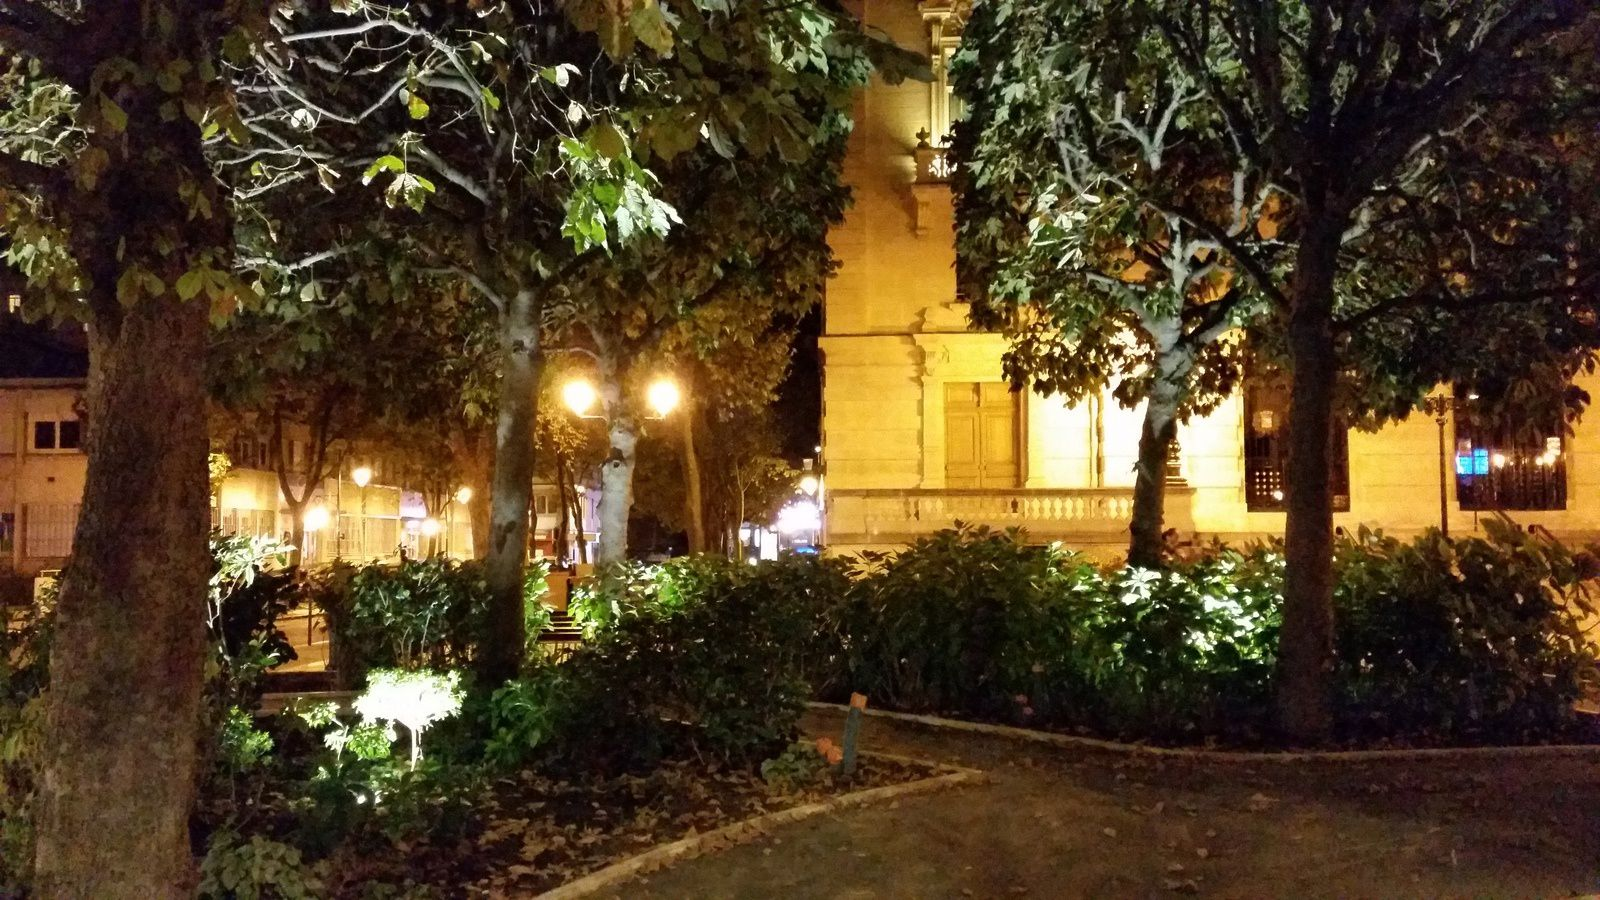 La Mairie de Colombes by night : c'est bien joli !